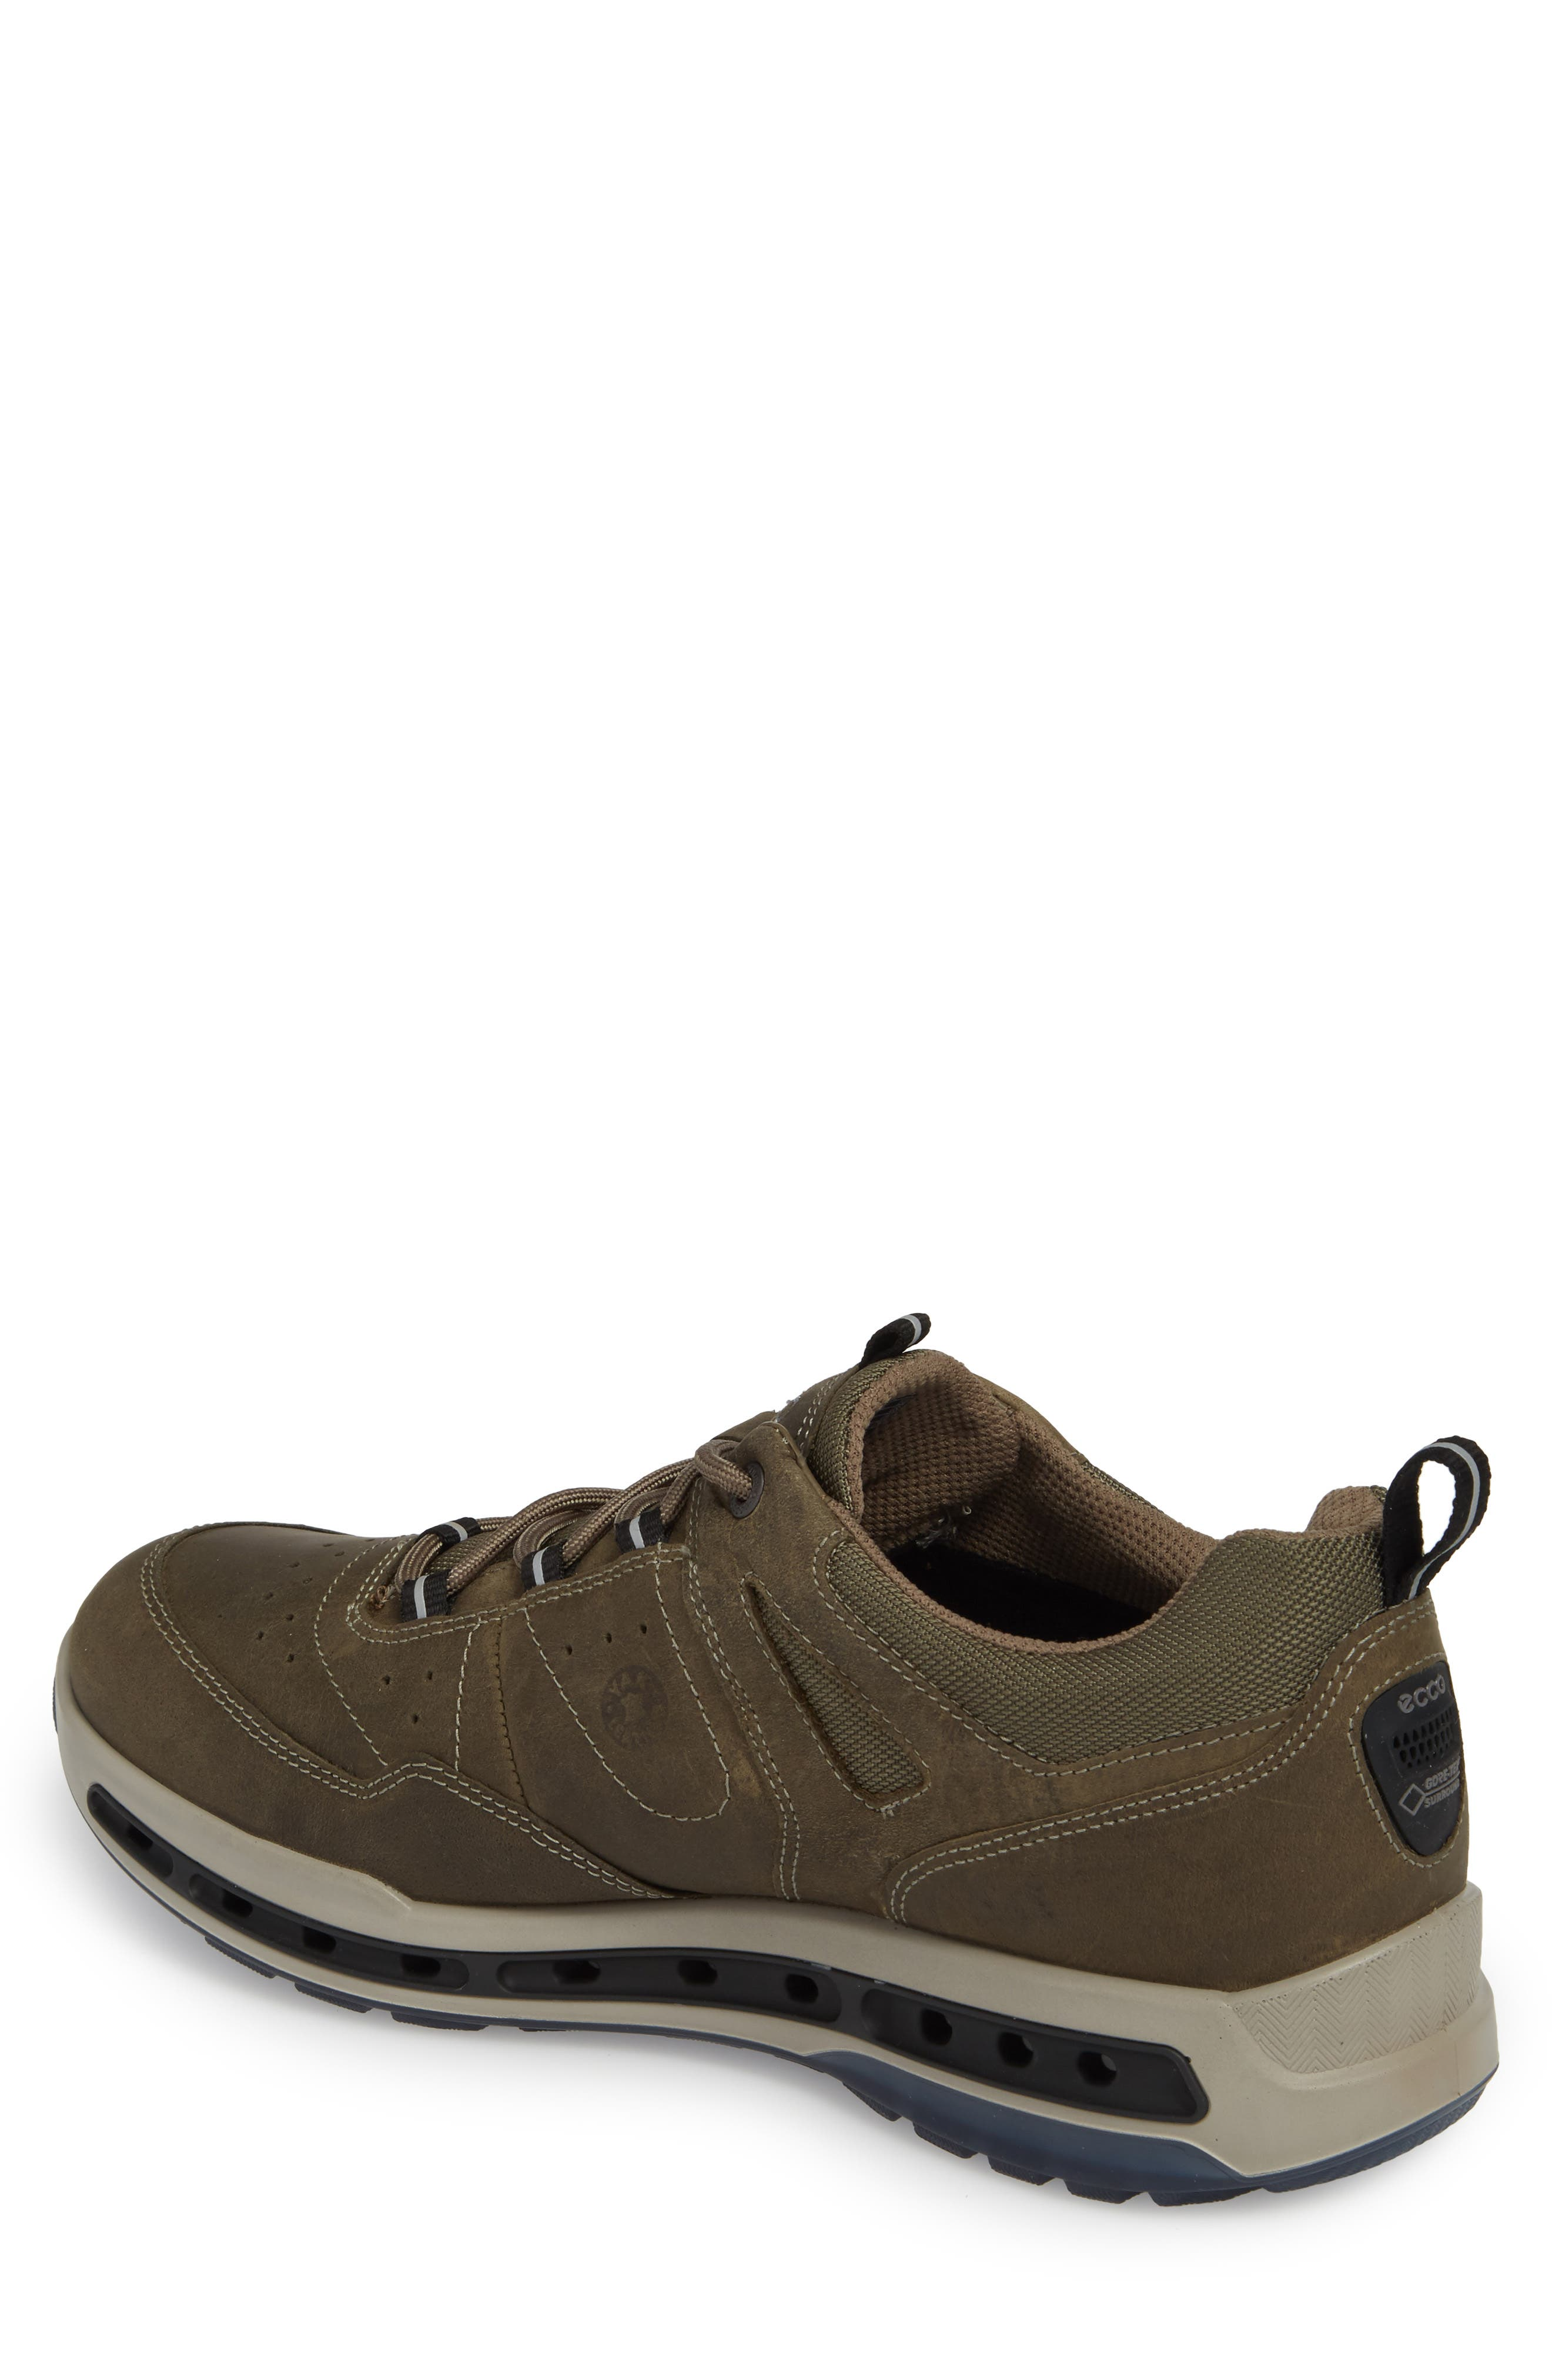 Cool Walk Gore-Tex<sup>®</sup> Sneaker,                             Alternate thumbnail 2, color,                             Tarmac Leather